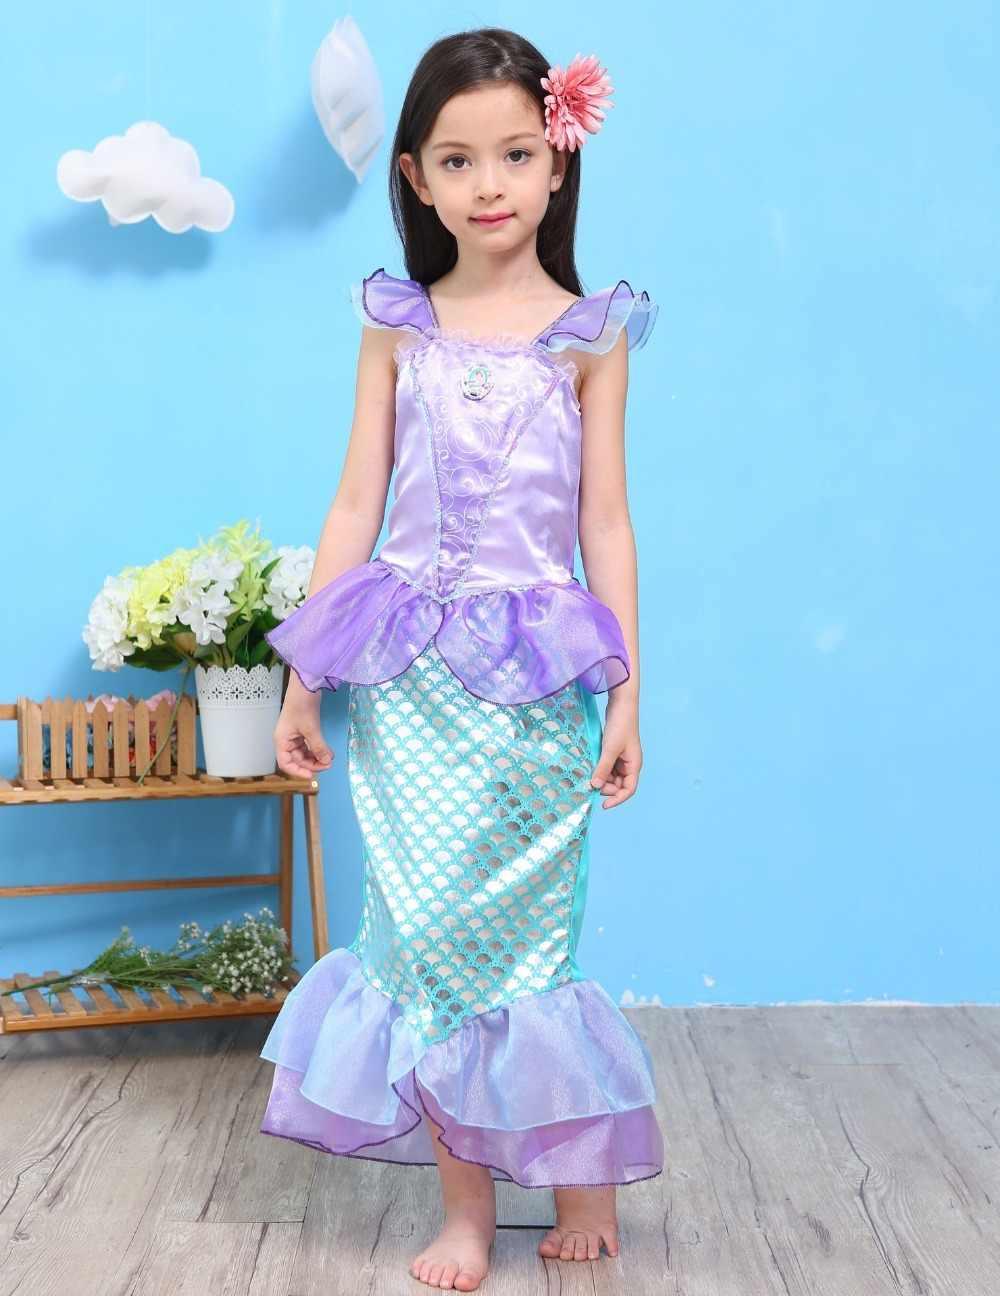 Disfraz De Cosplay Para Niñas Princesa Ariel Niña La